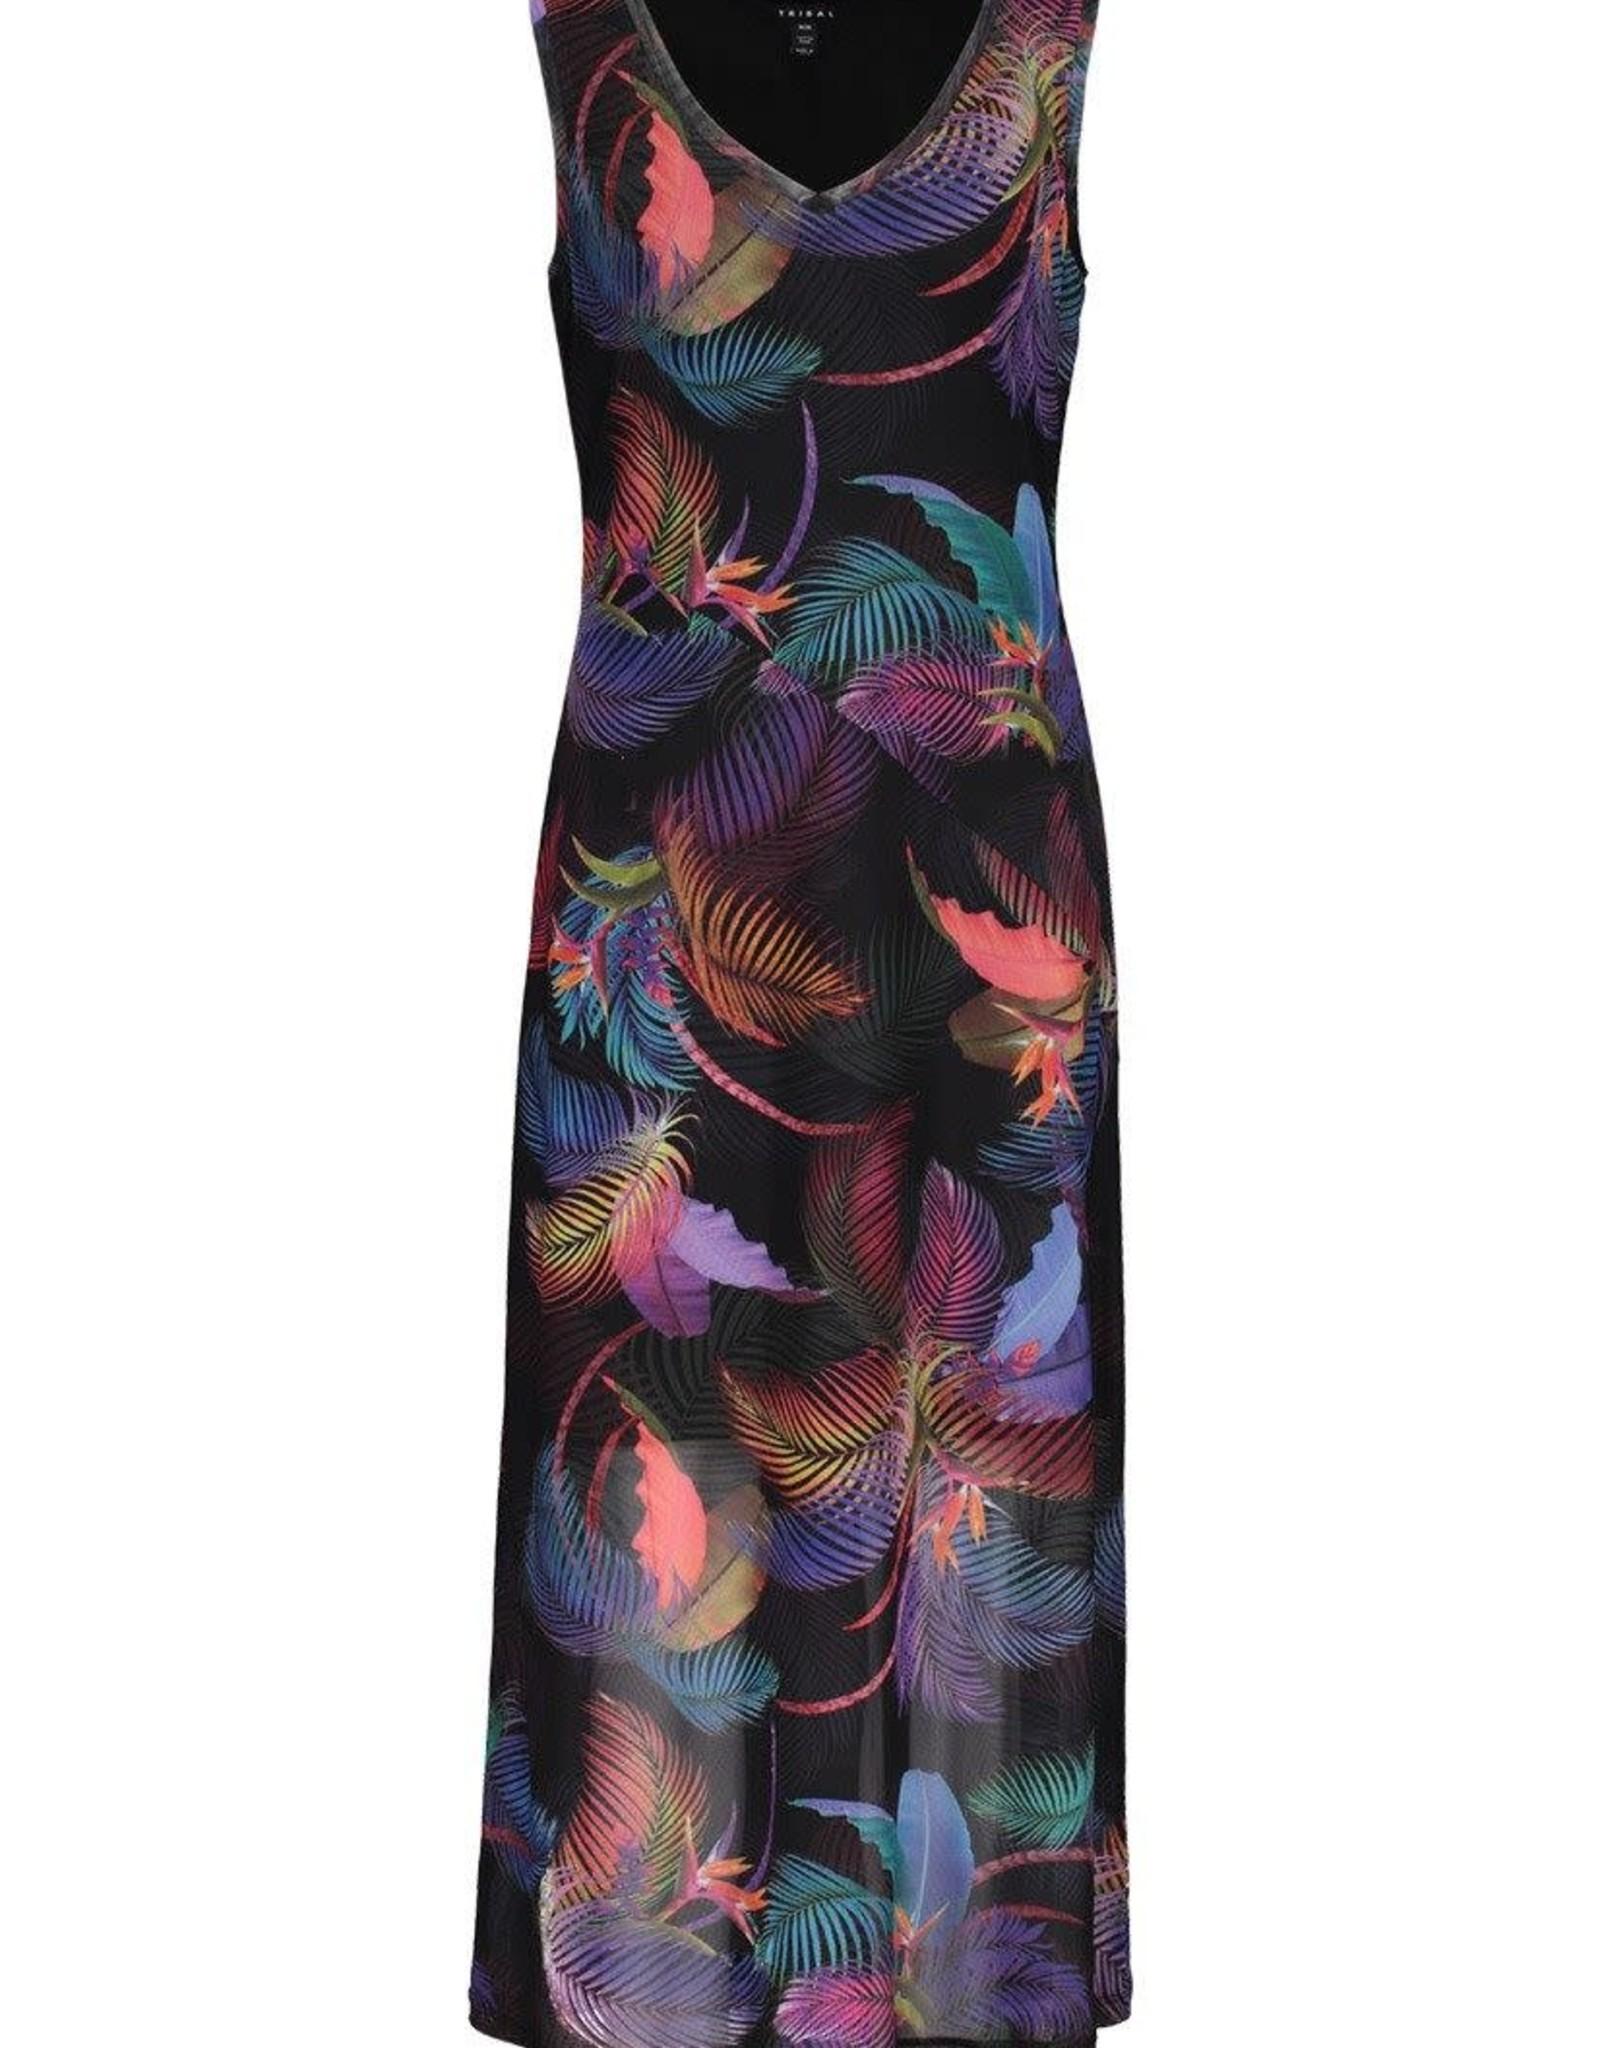 Tribal Multi Colored Tropical Print Maxi Dress